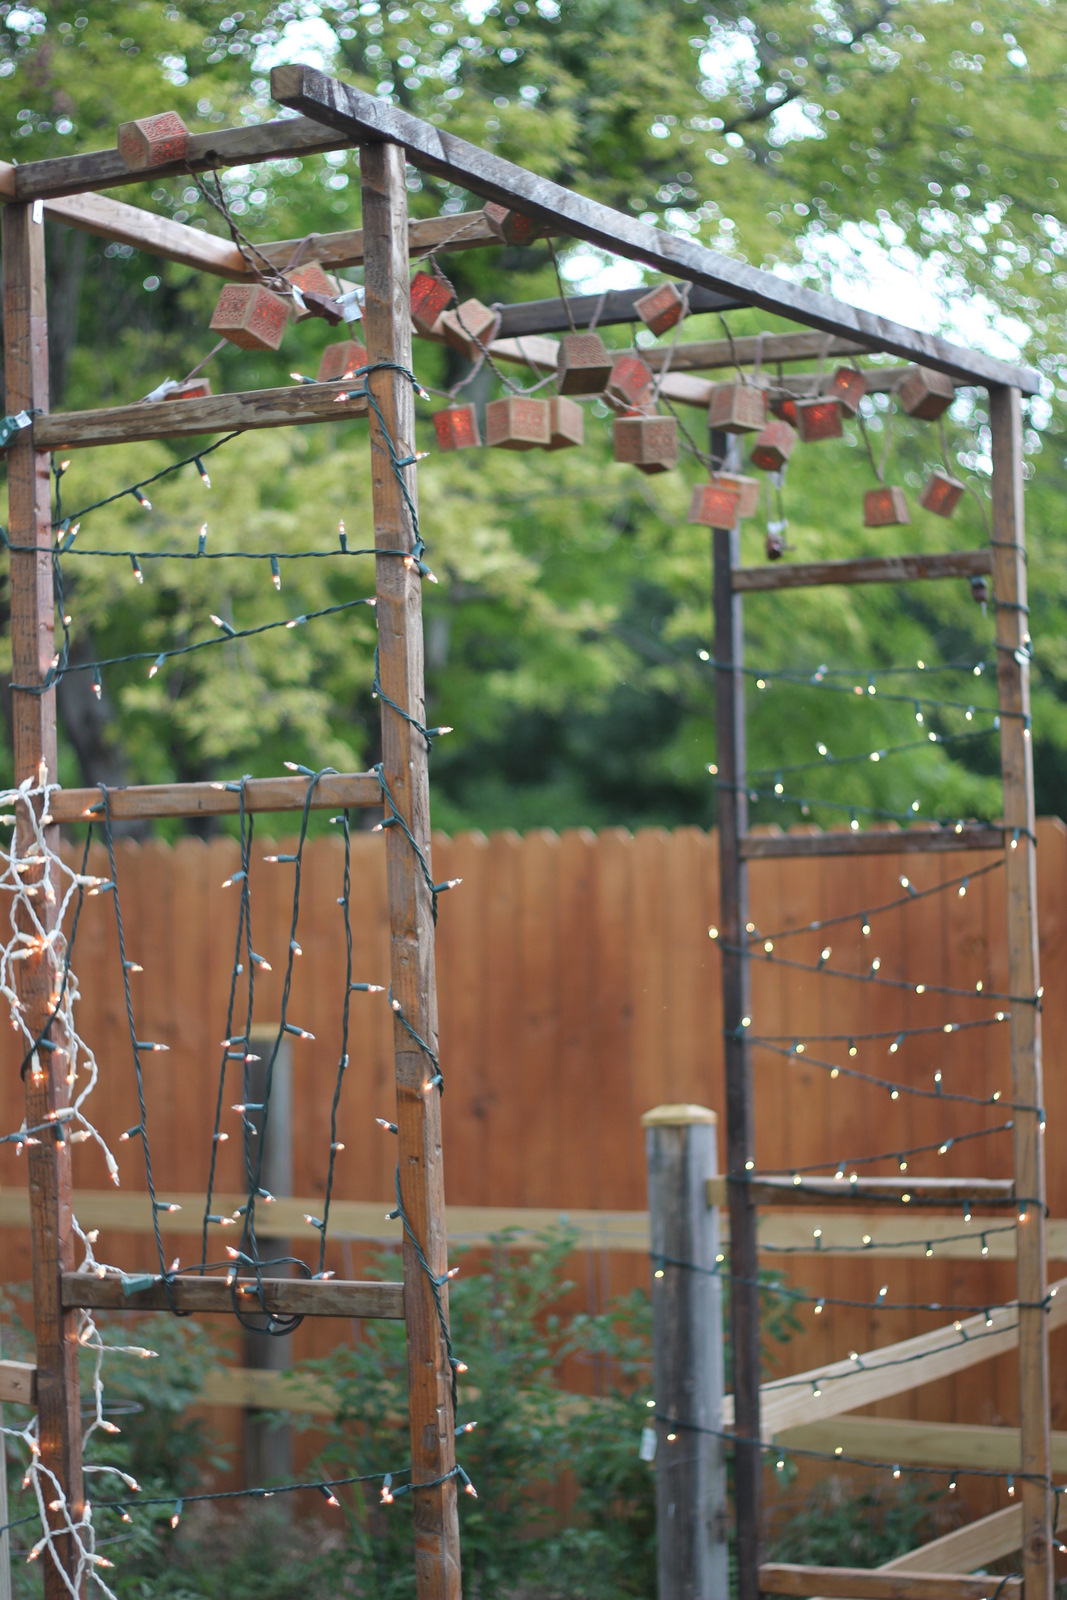 Rustic garden gate for Rustic garden gate designs